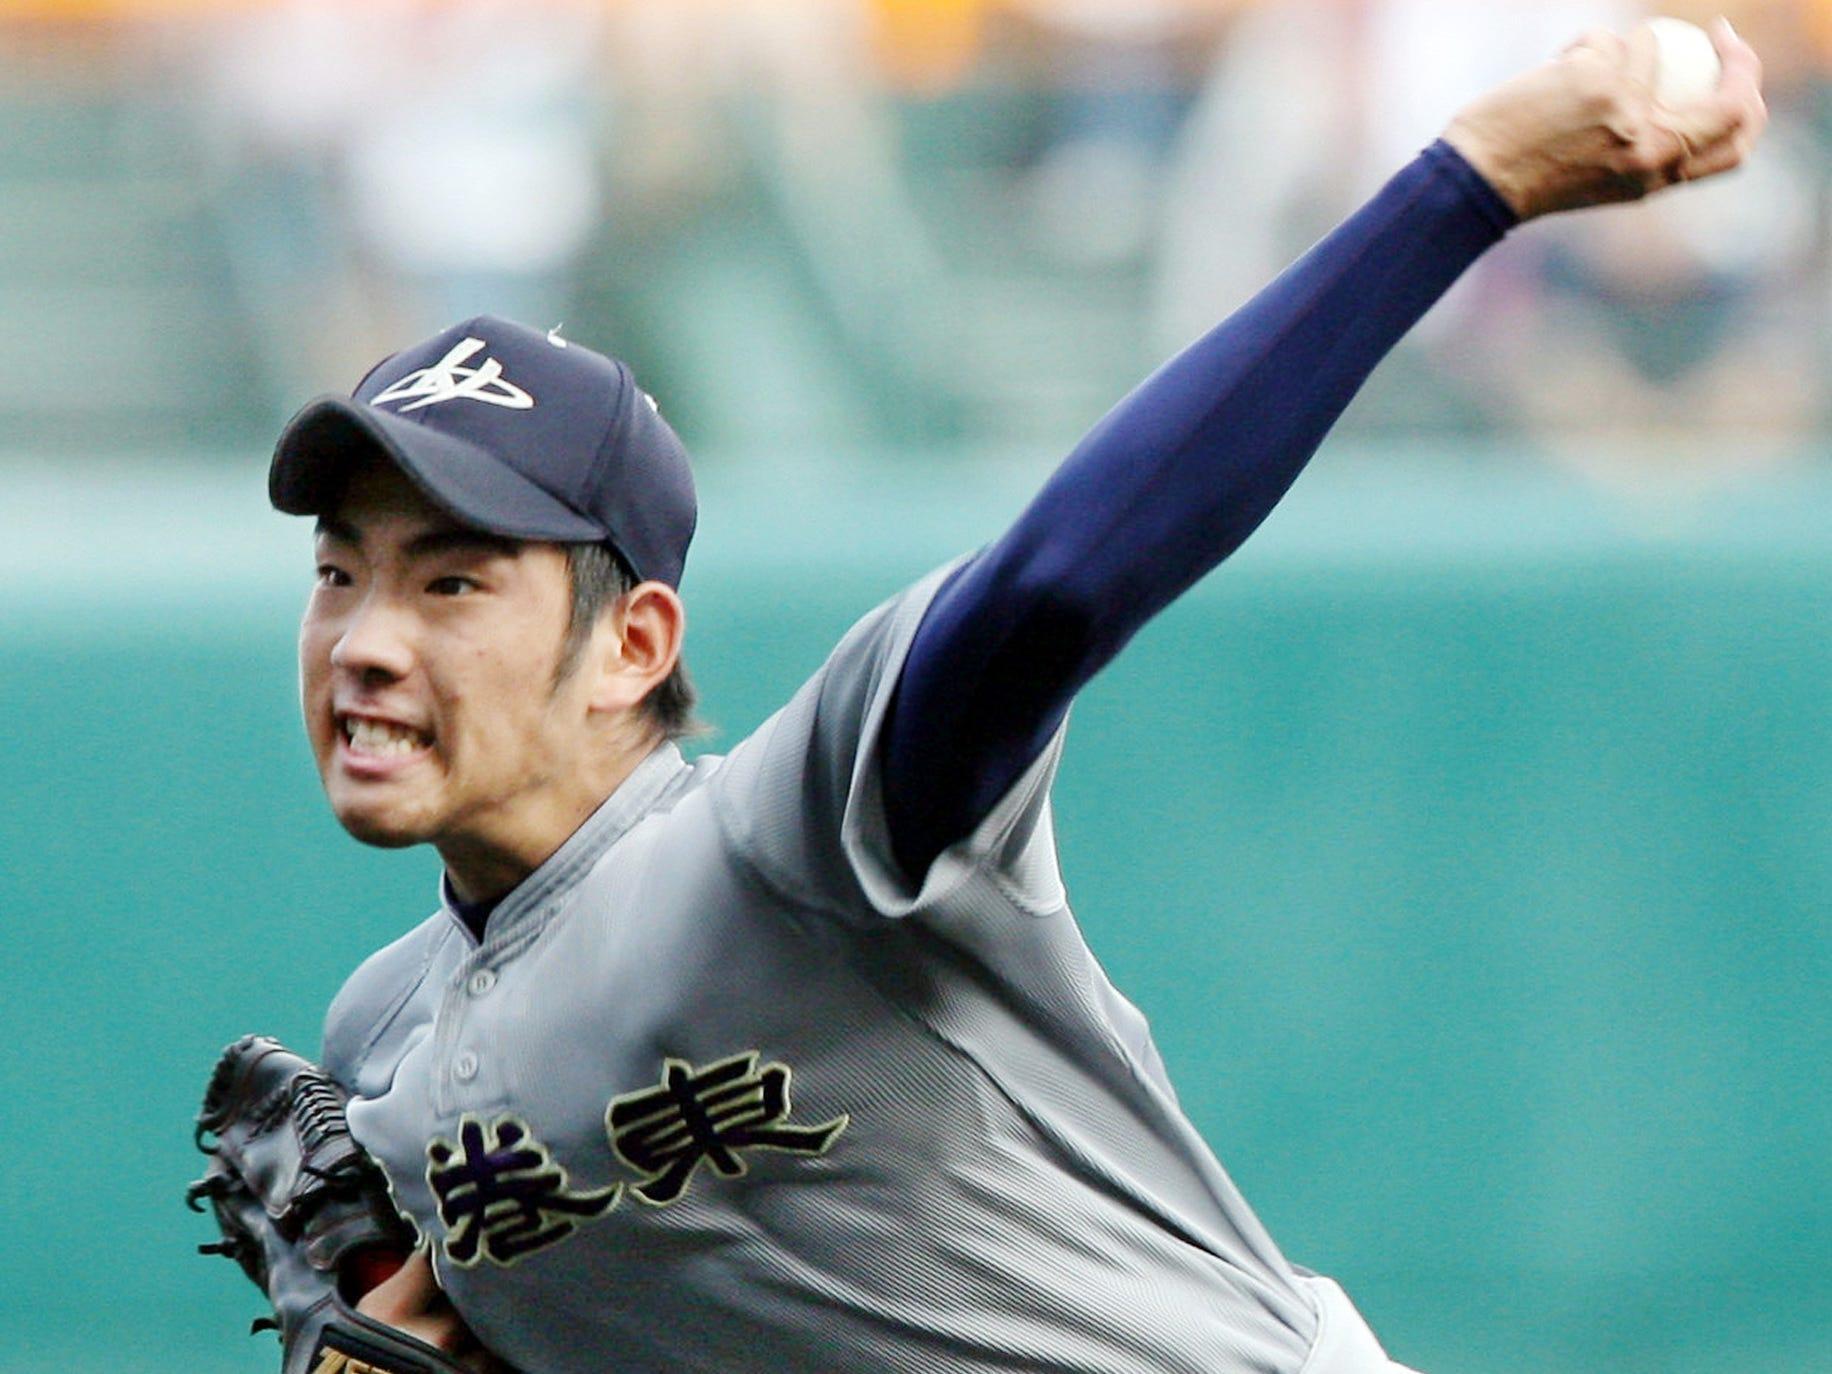 4. Yusei Kikuchi, LHP, Mariners